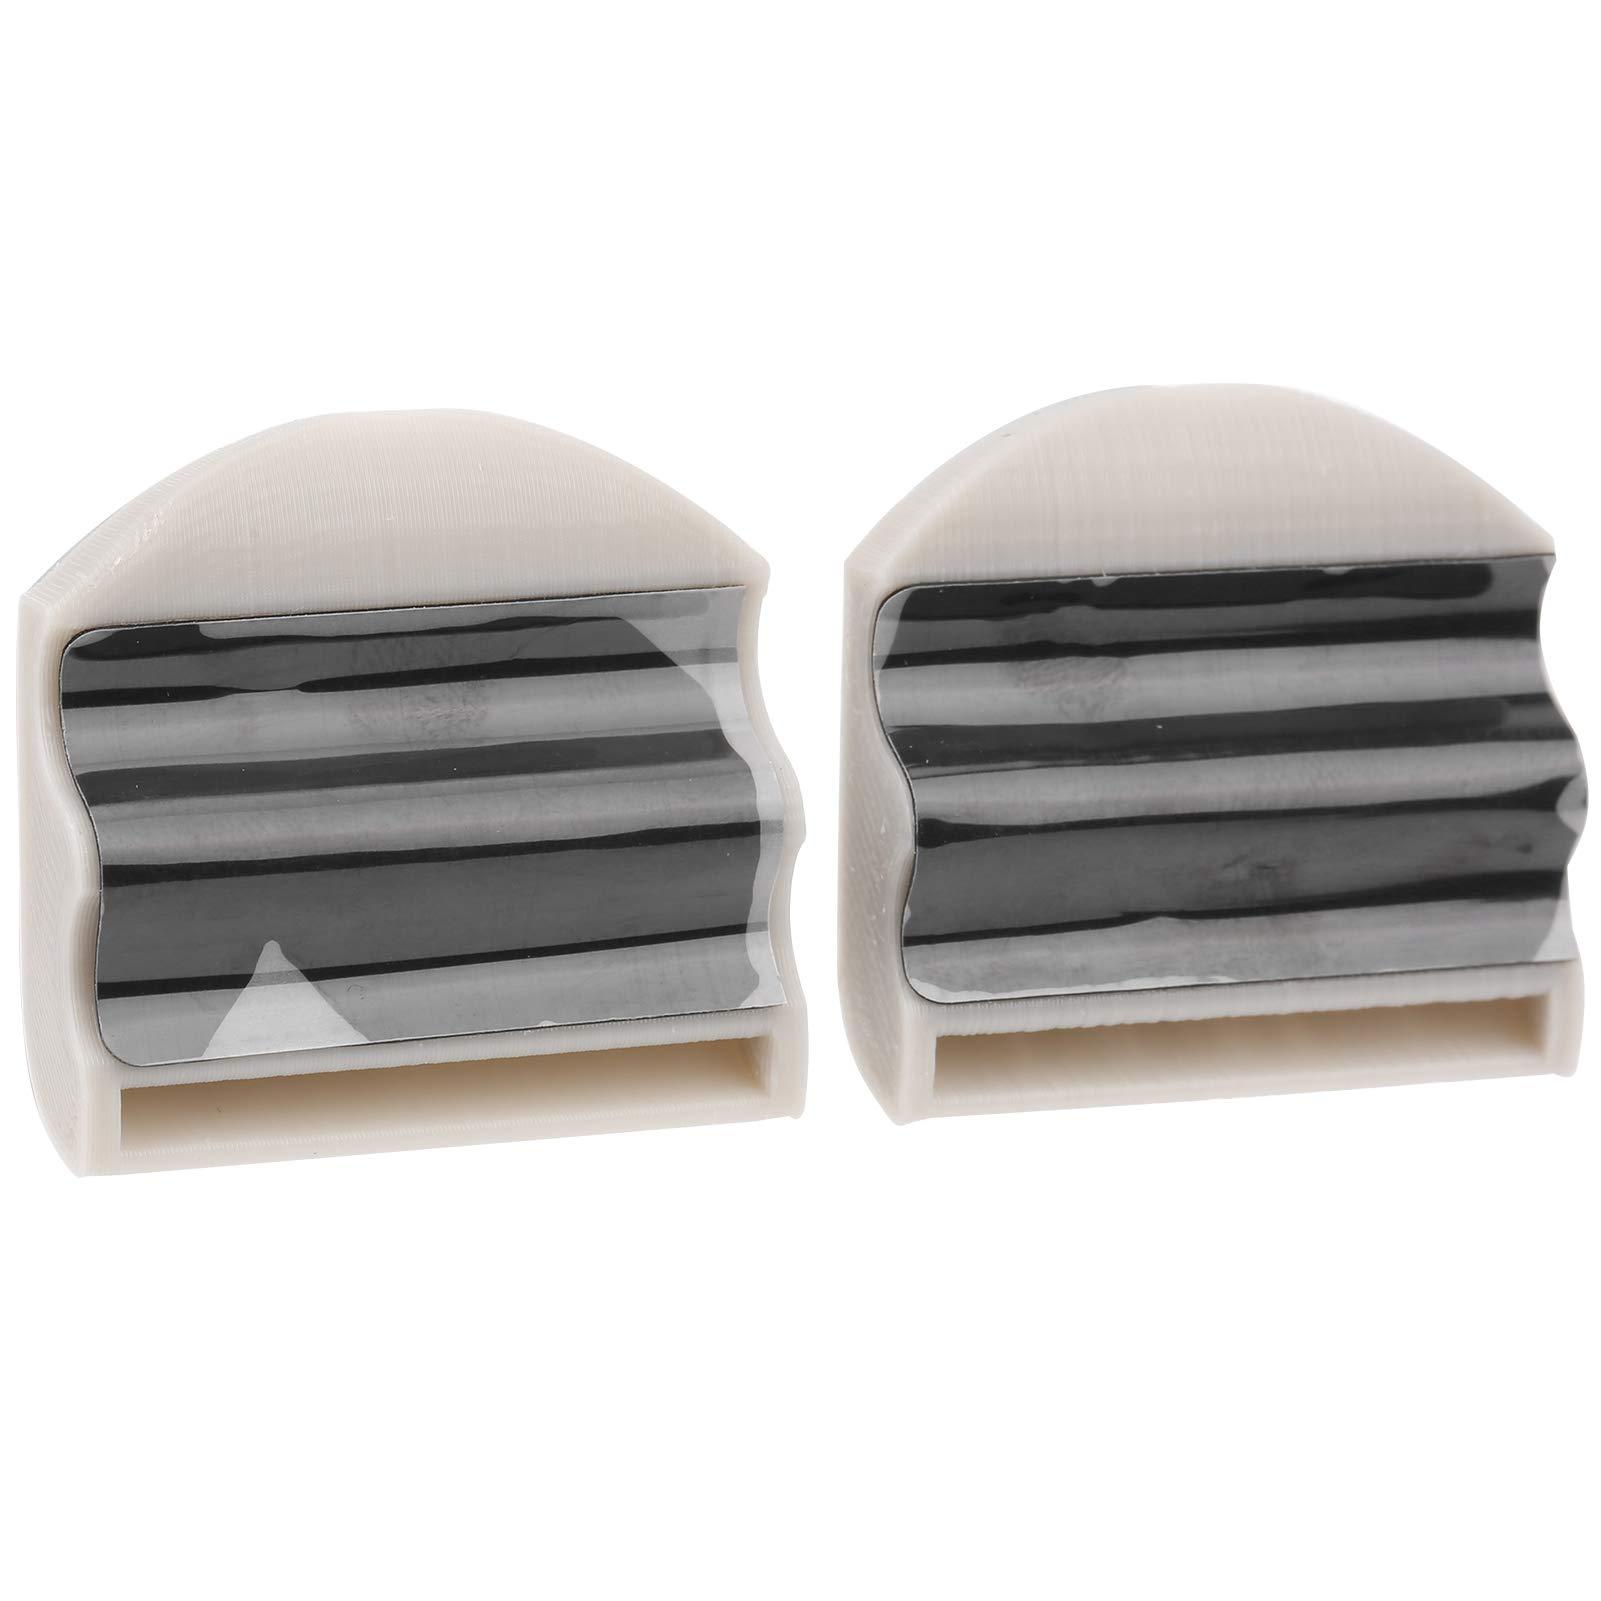 DAUERHAFT PLA material Stabilizer 2‑gear groove Stabilizer for DJI OM4 for More Mobile Phones